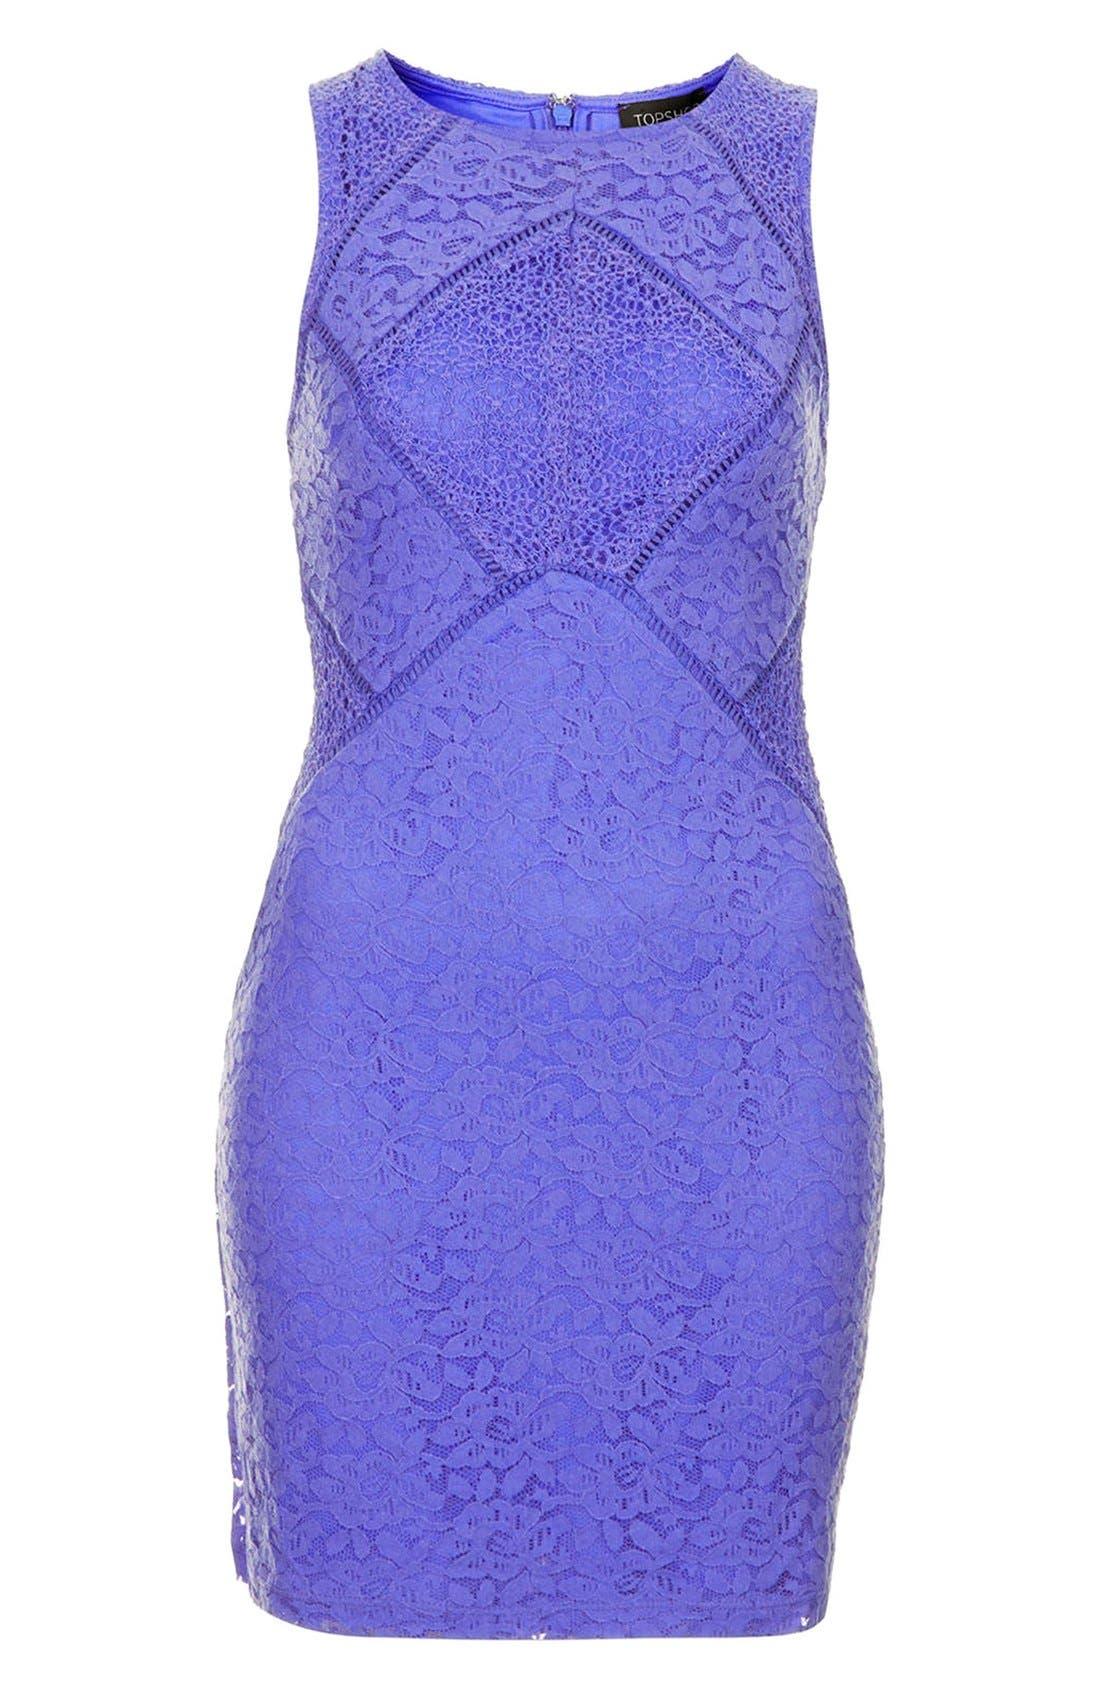 Alternate Image 3  - Topshop Lace Mix Body-Con Dress